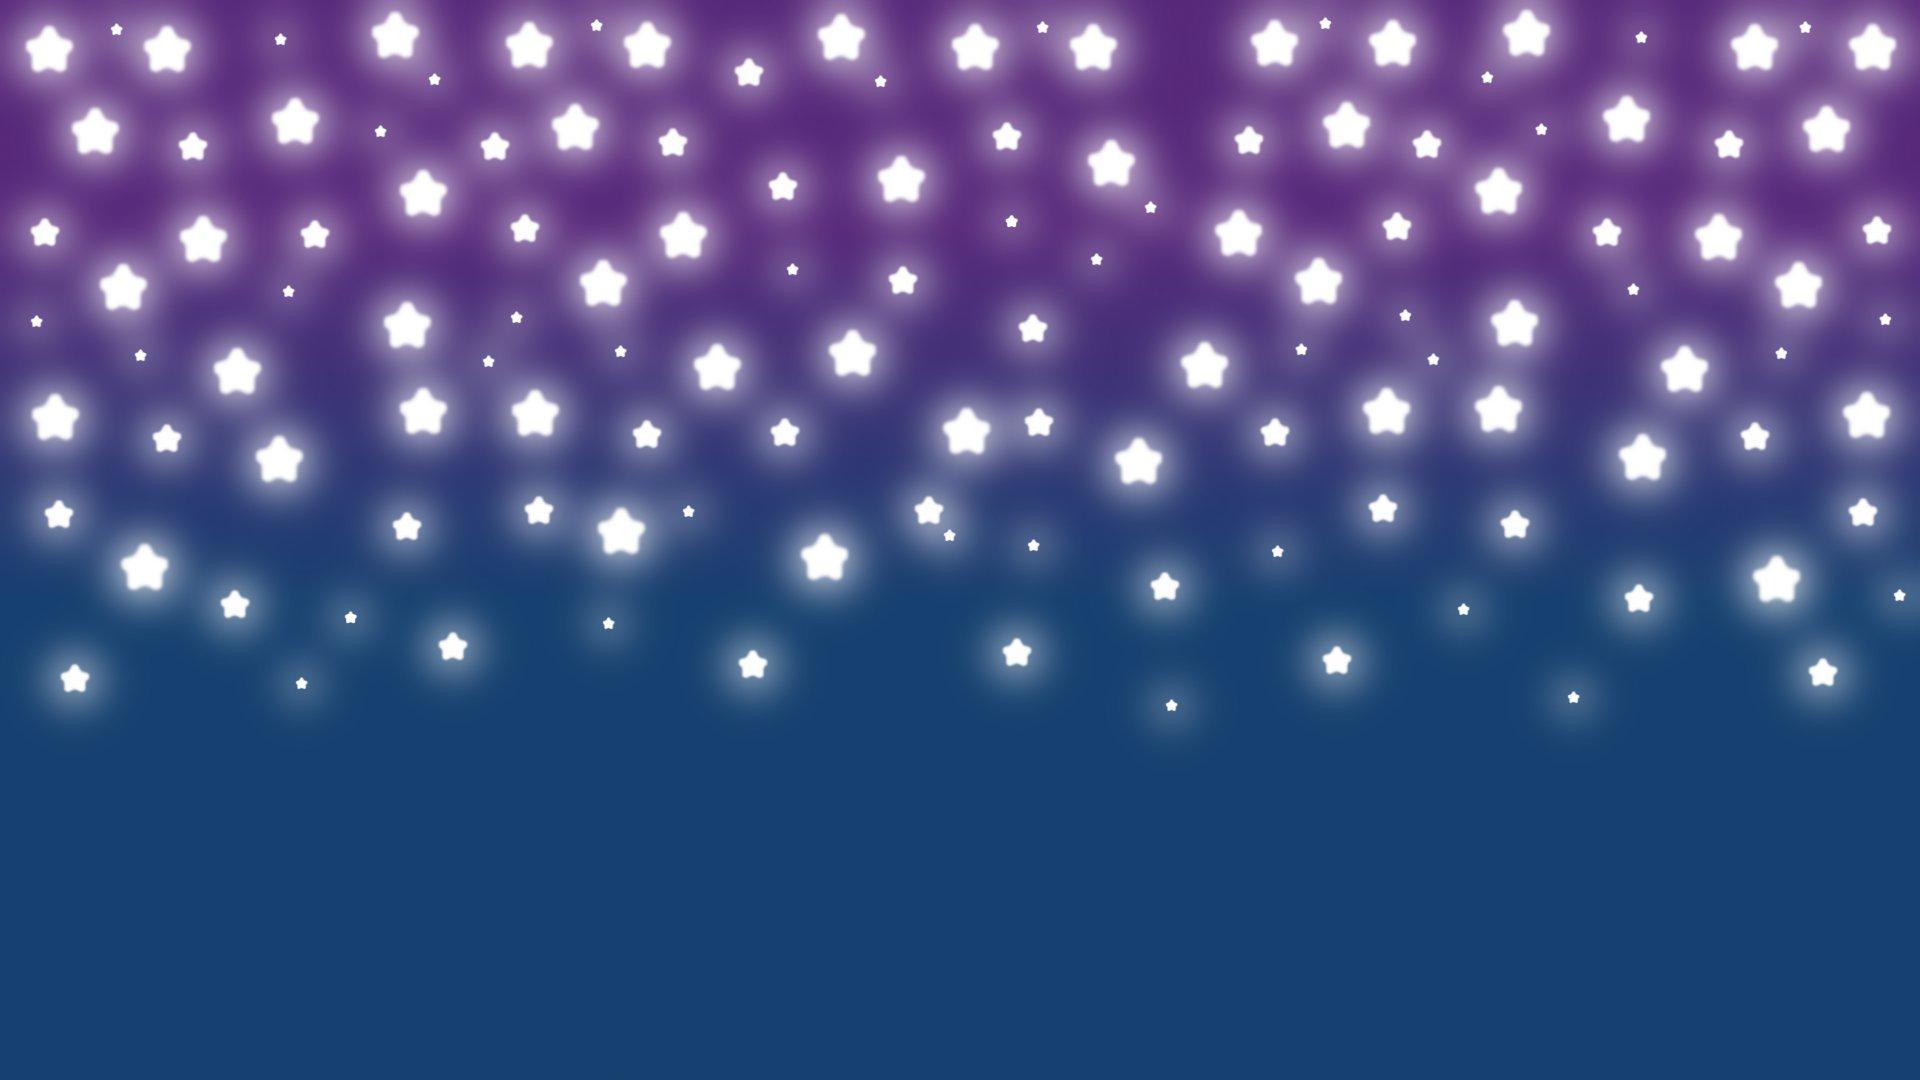 backgrounds stars - photo #23